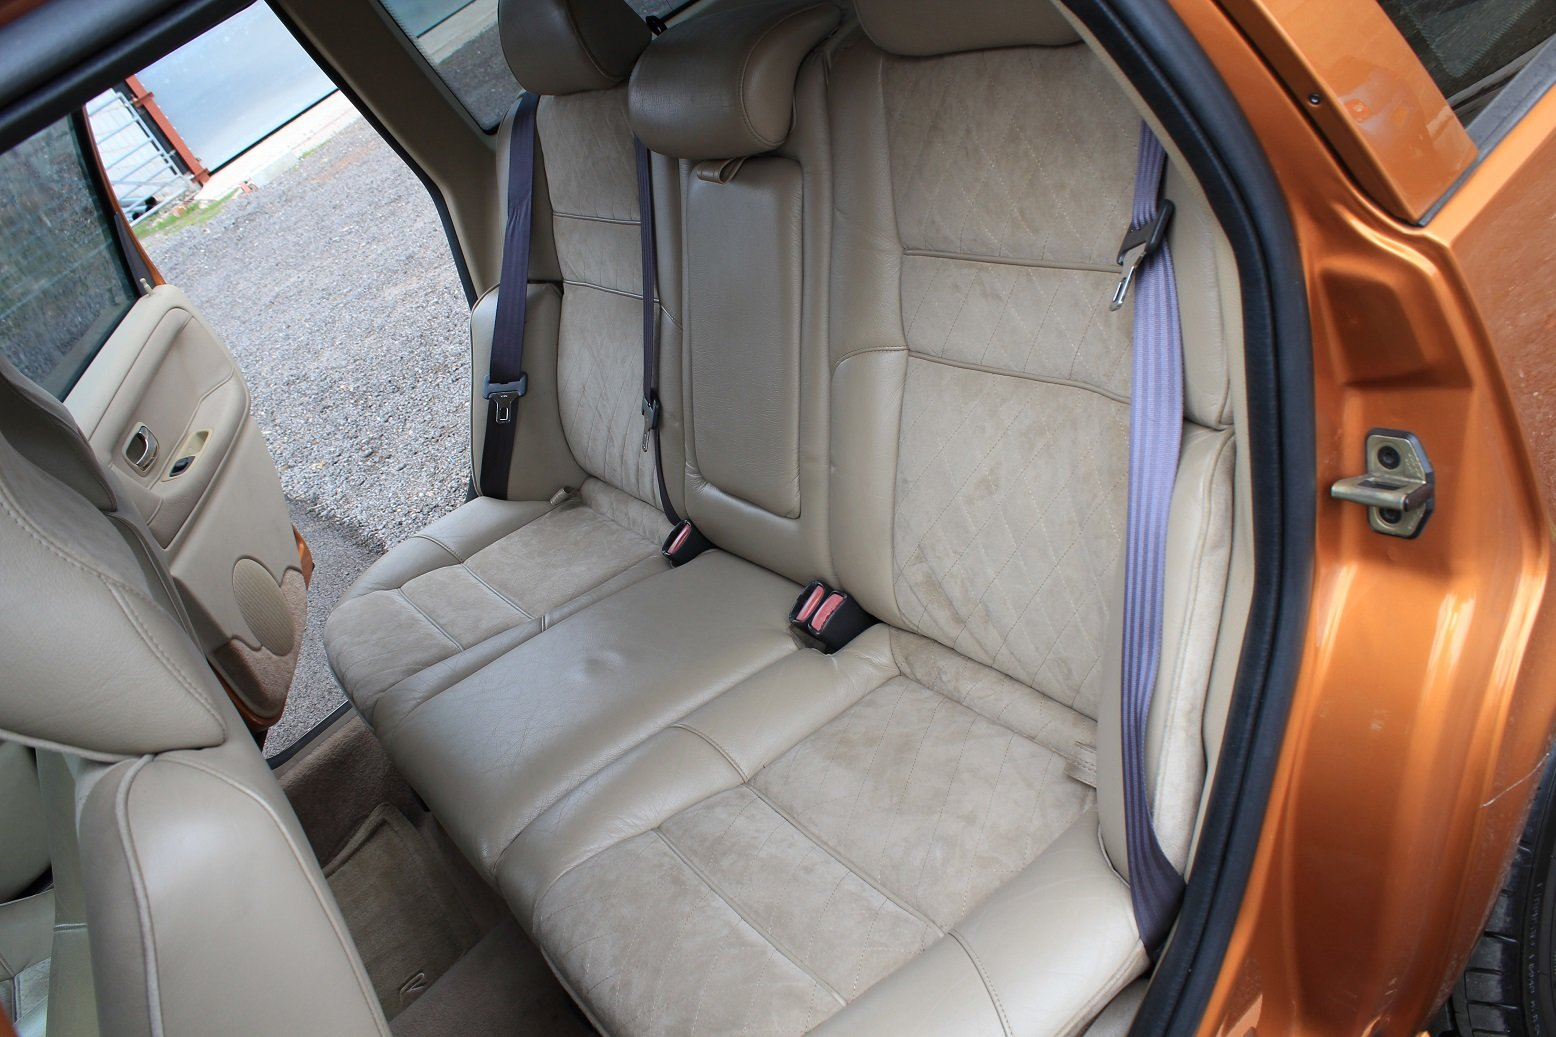 1997 V70R Estate - 4WD 2.4L 20V Turbo 240 bhp. Concourse Cond. For Sale (picture 4 of 6)